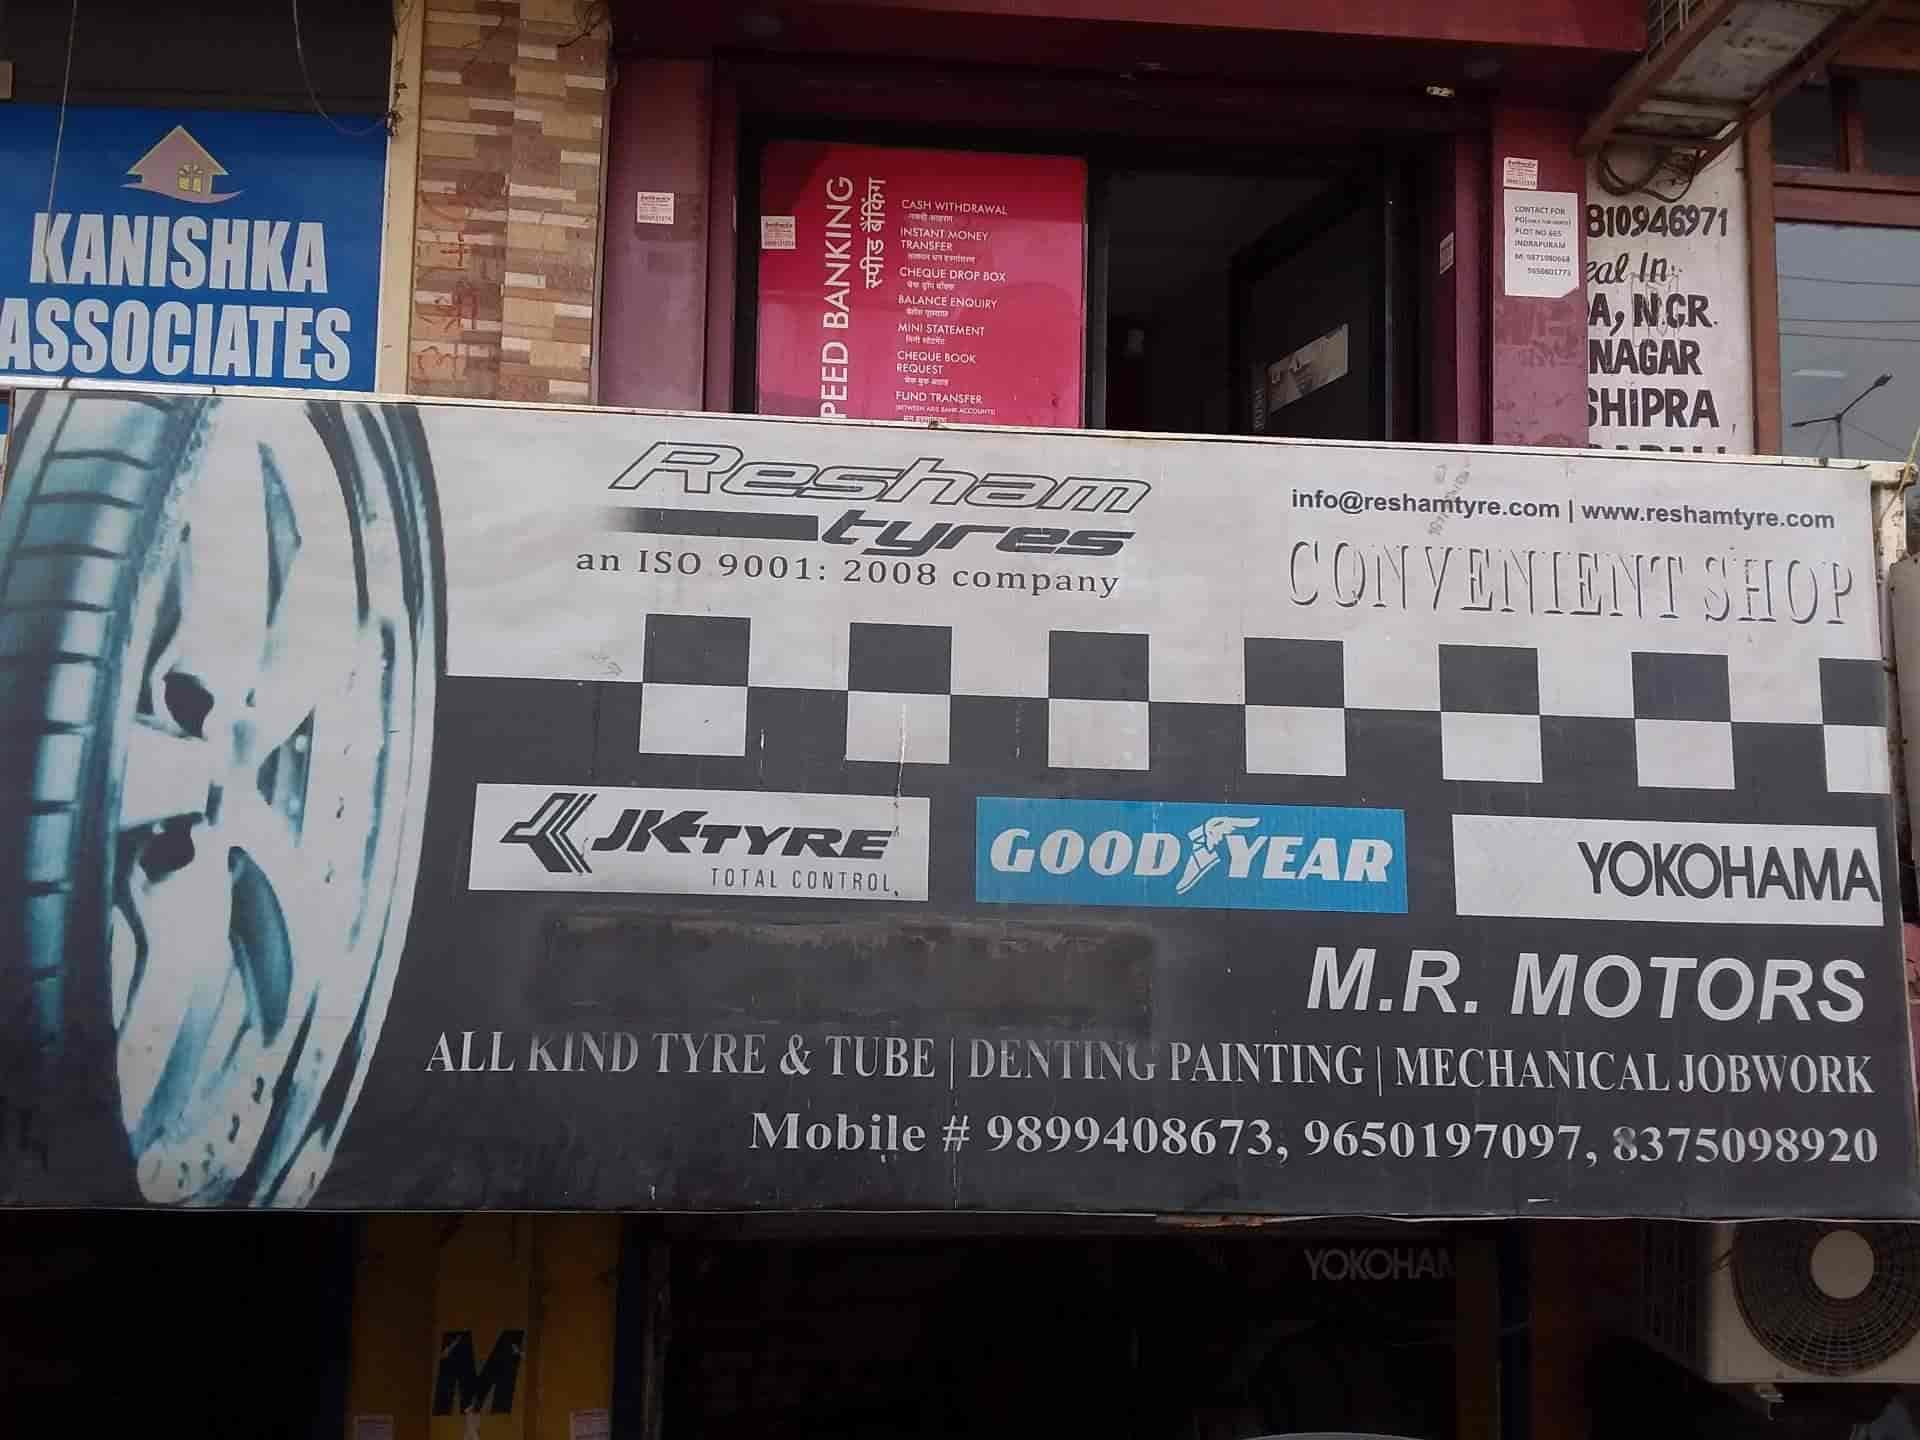 M R Motors Photos, Indirapuram, Ghaziabad- Pictures & Images Gallery